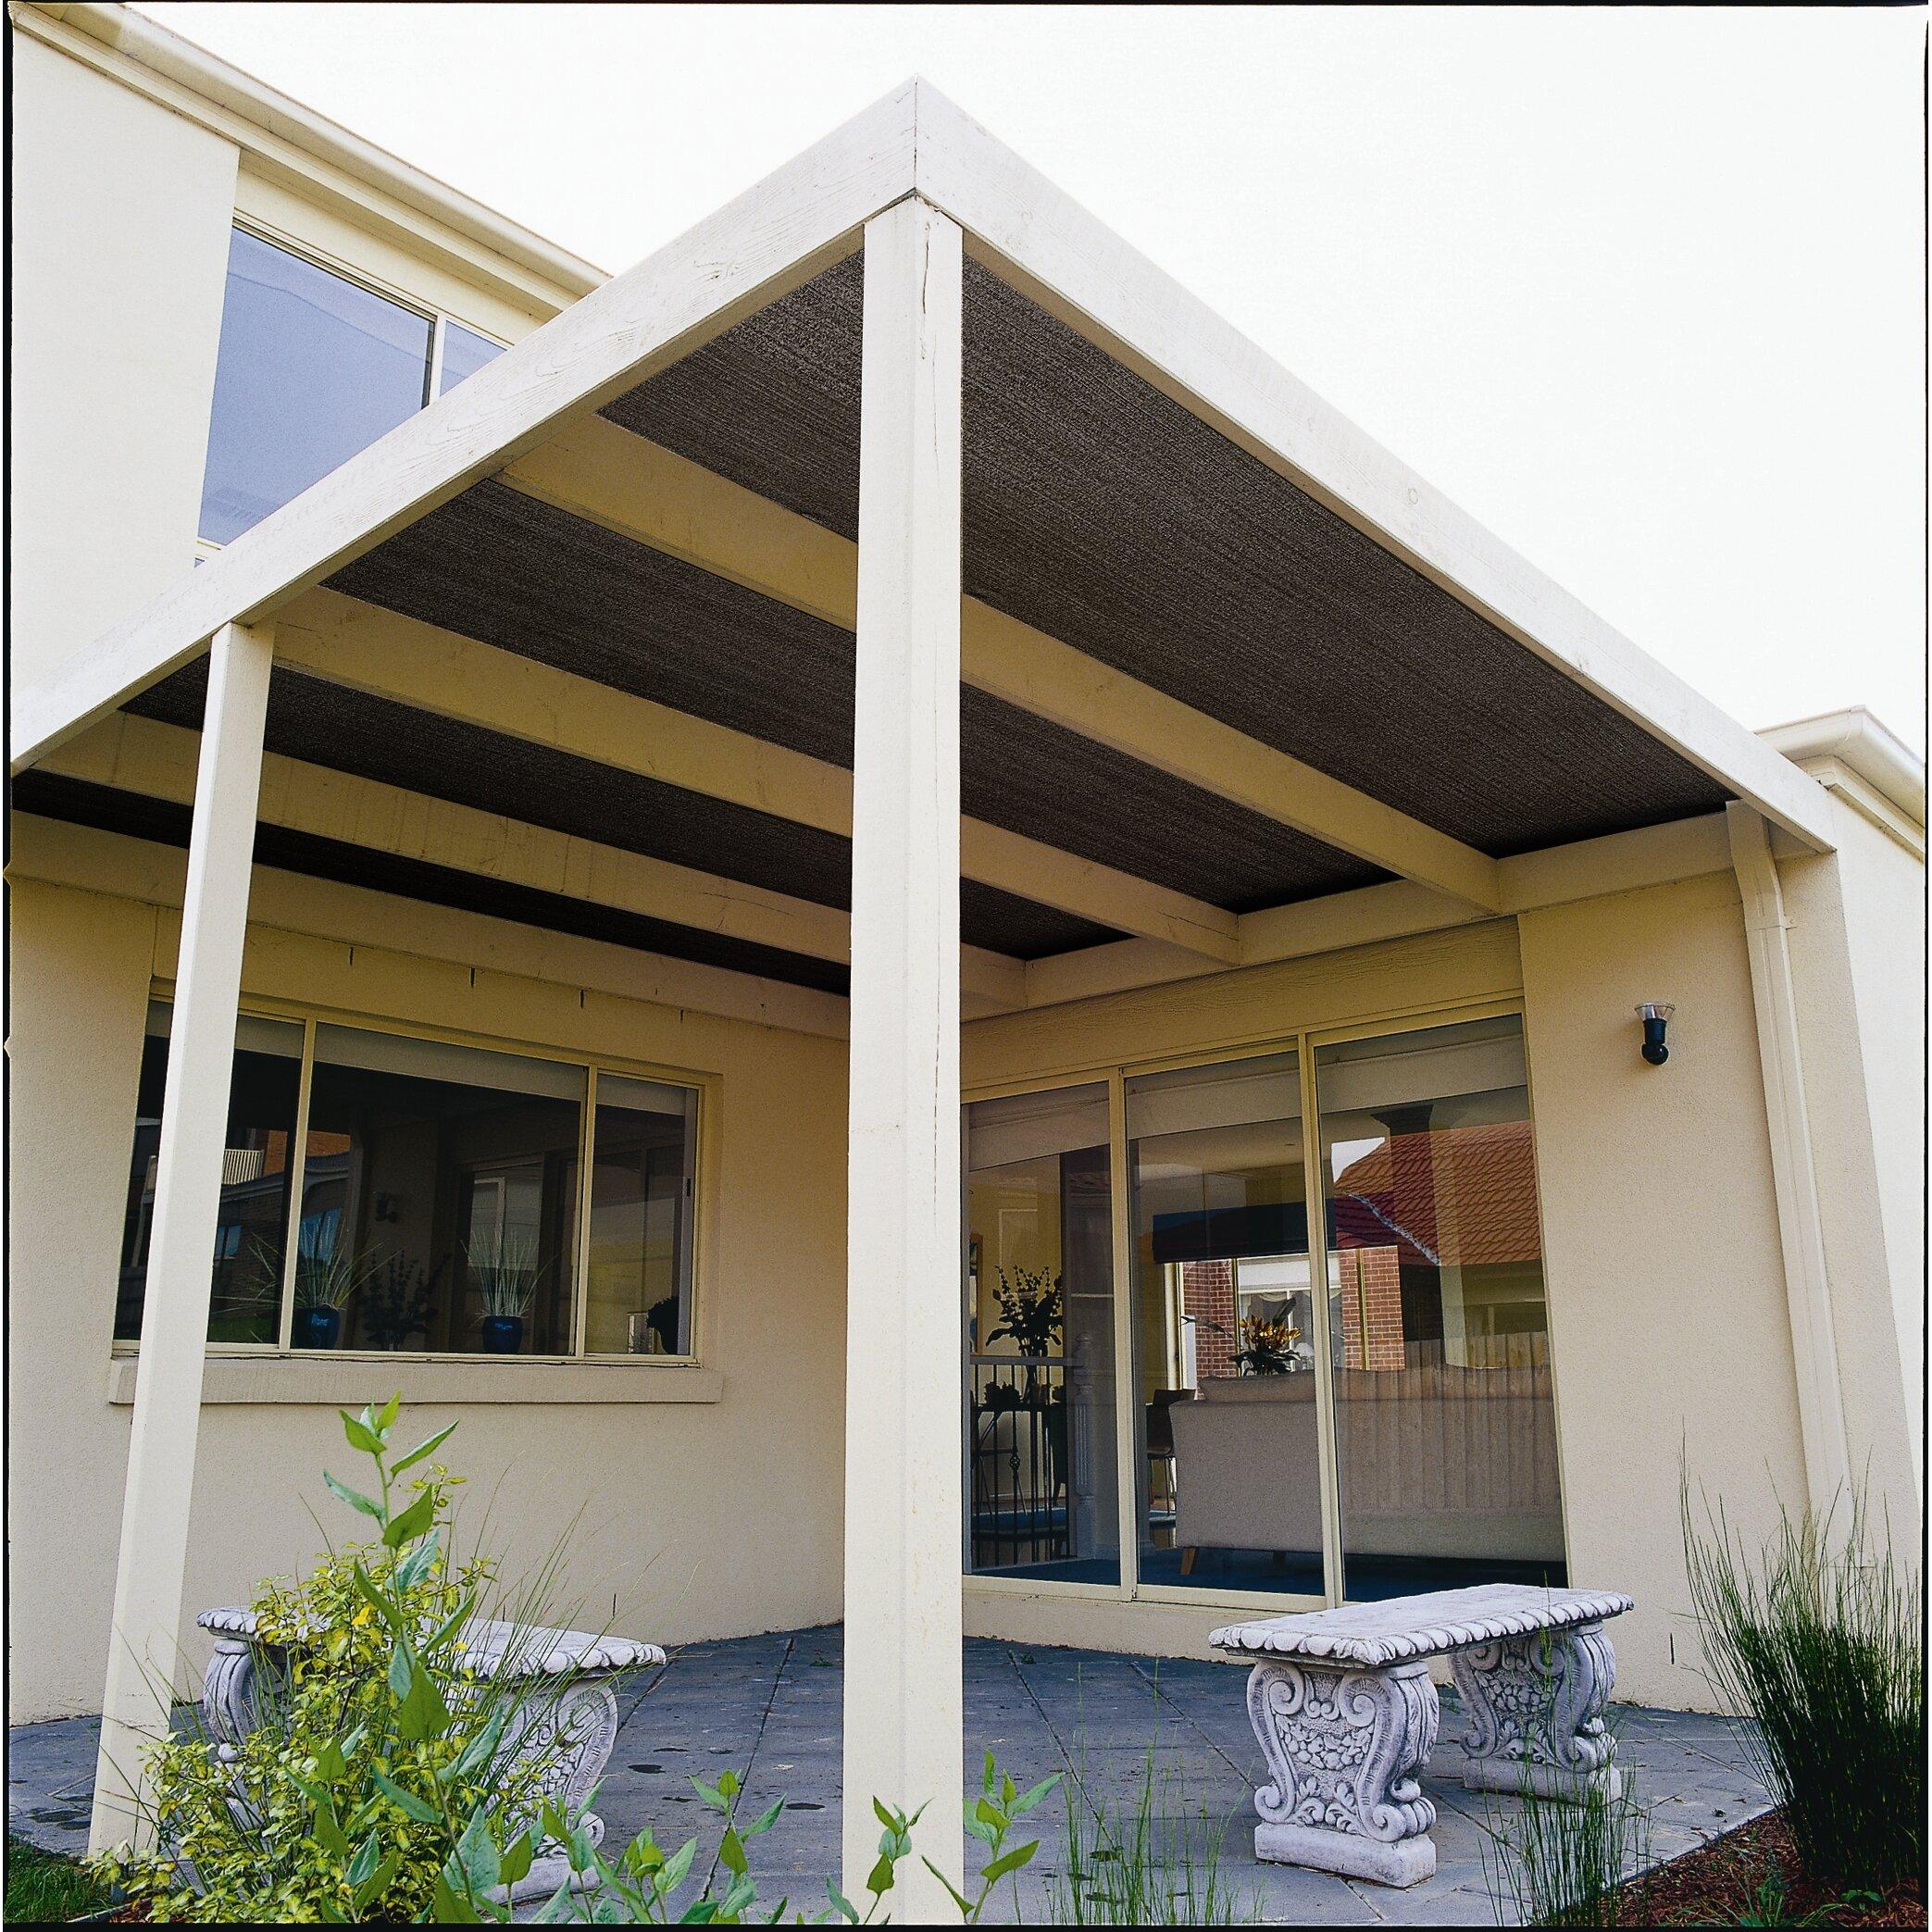 Exterior sun shades for windows - Cloth Roll 50 Uv Block Outdoor Solar Shade